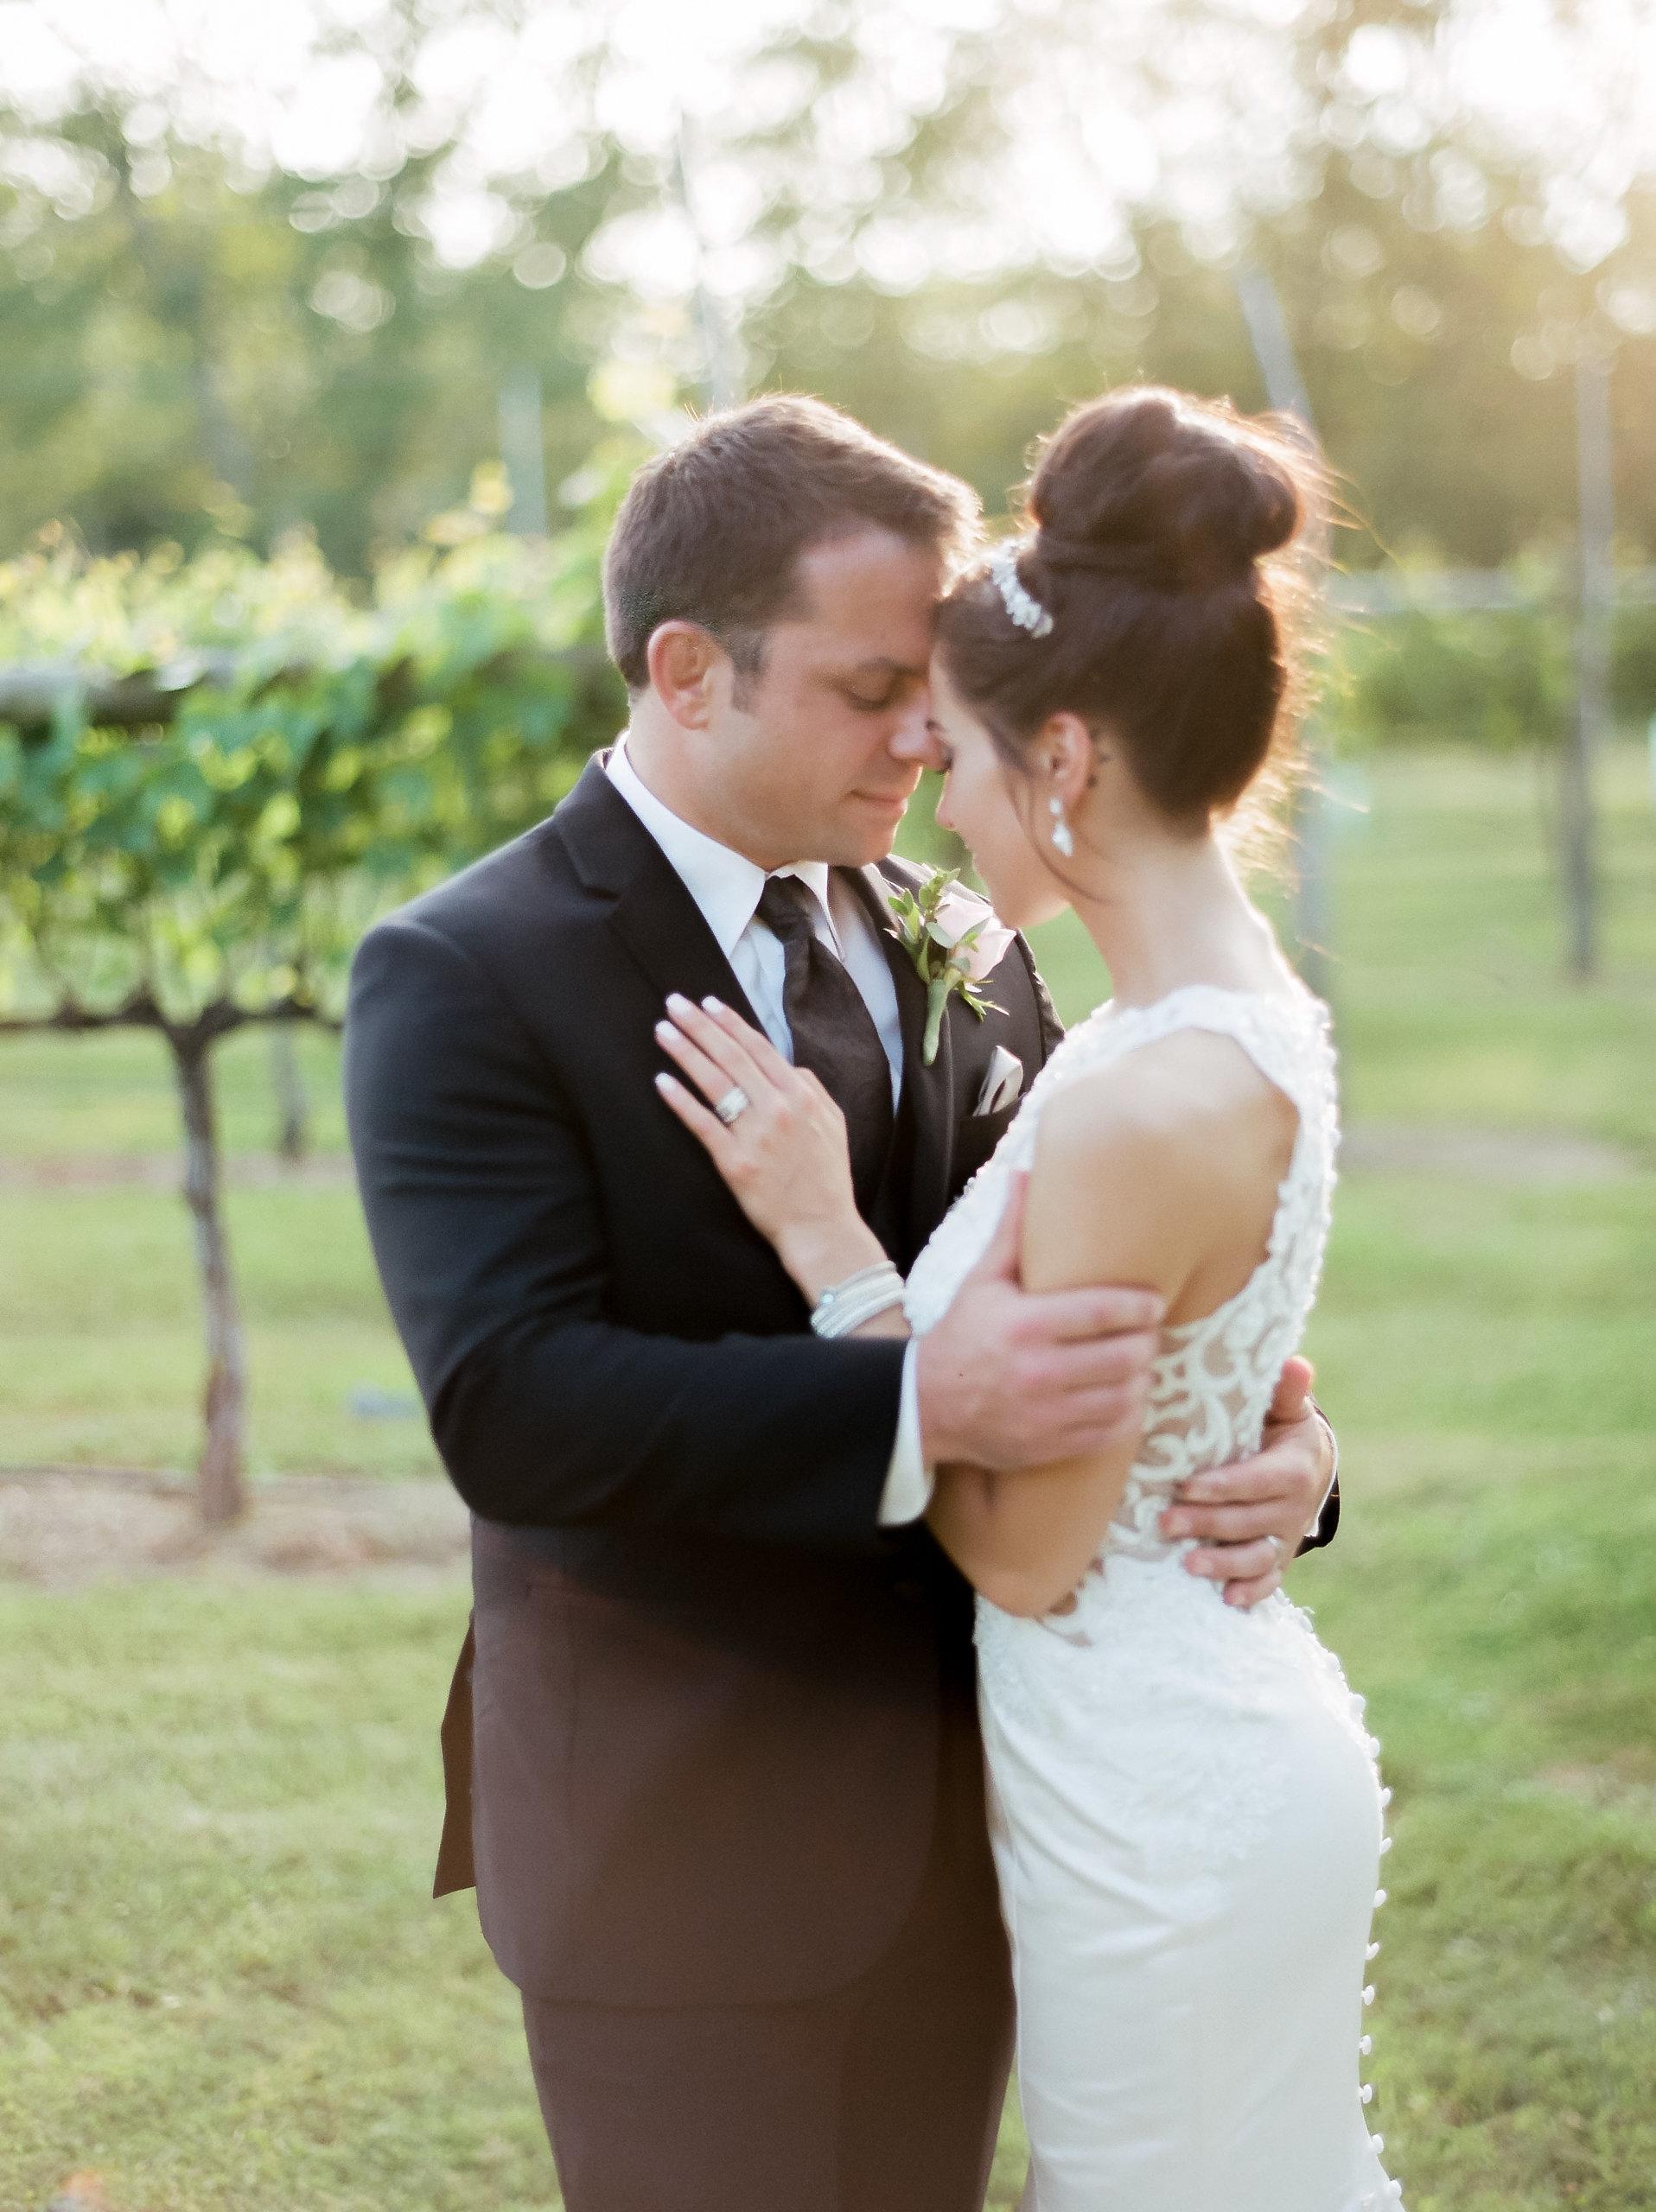 MagdalenaStudios_WeddingPhotographer_WillowCreekWinery_CarissaJoe-463.jpg